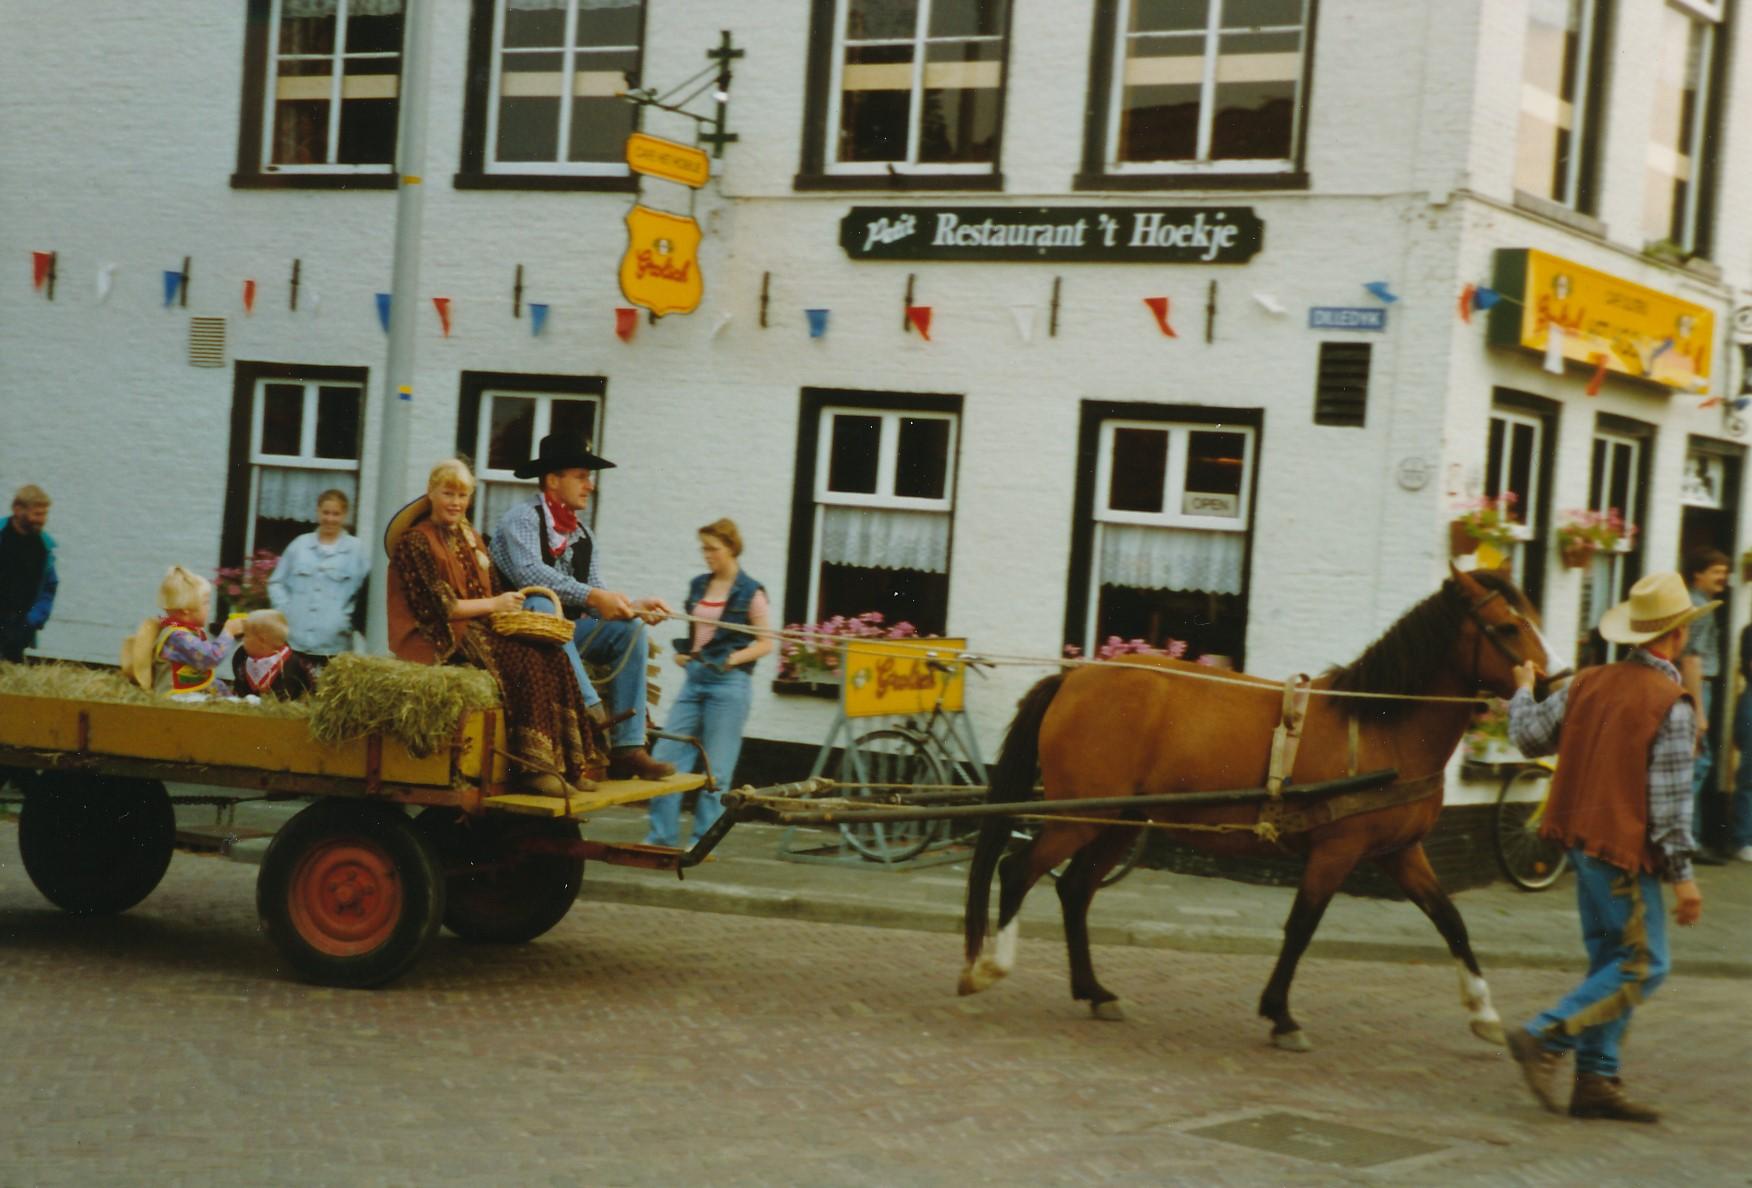 Fotoalbum Anneke Miedema, 011, Merke 1994, augustus, Frits Miedema, Baukje Boersma en Cor Miedema